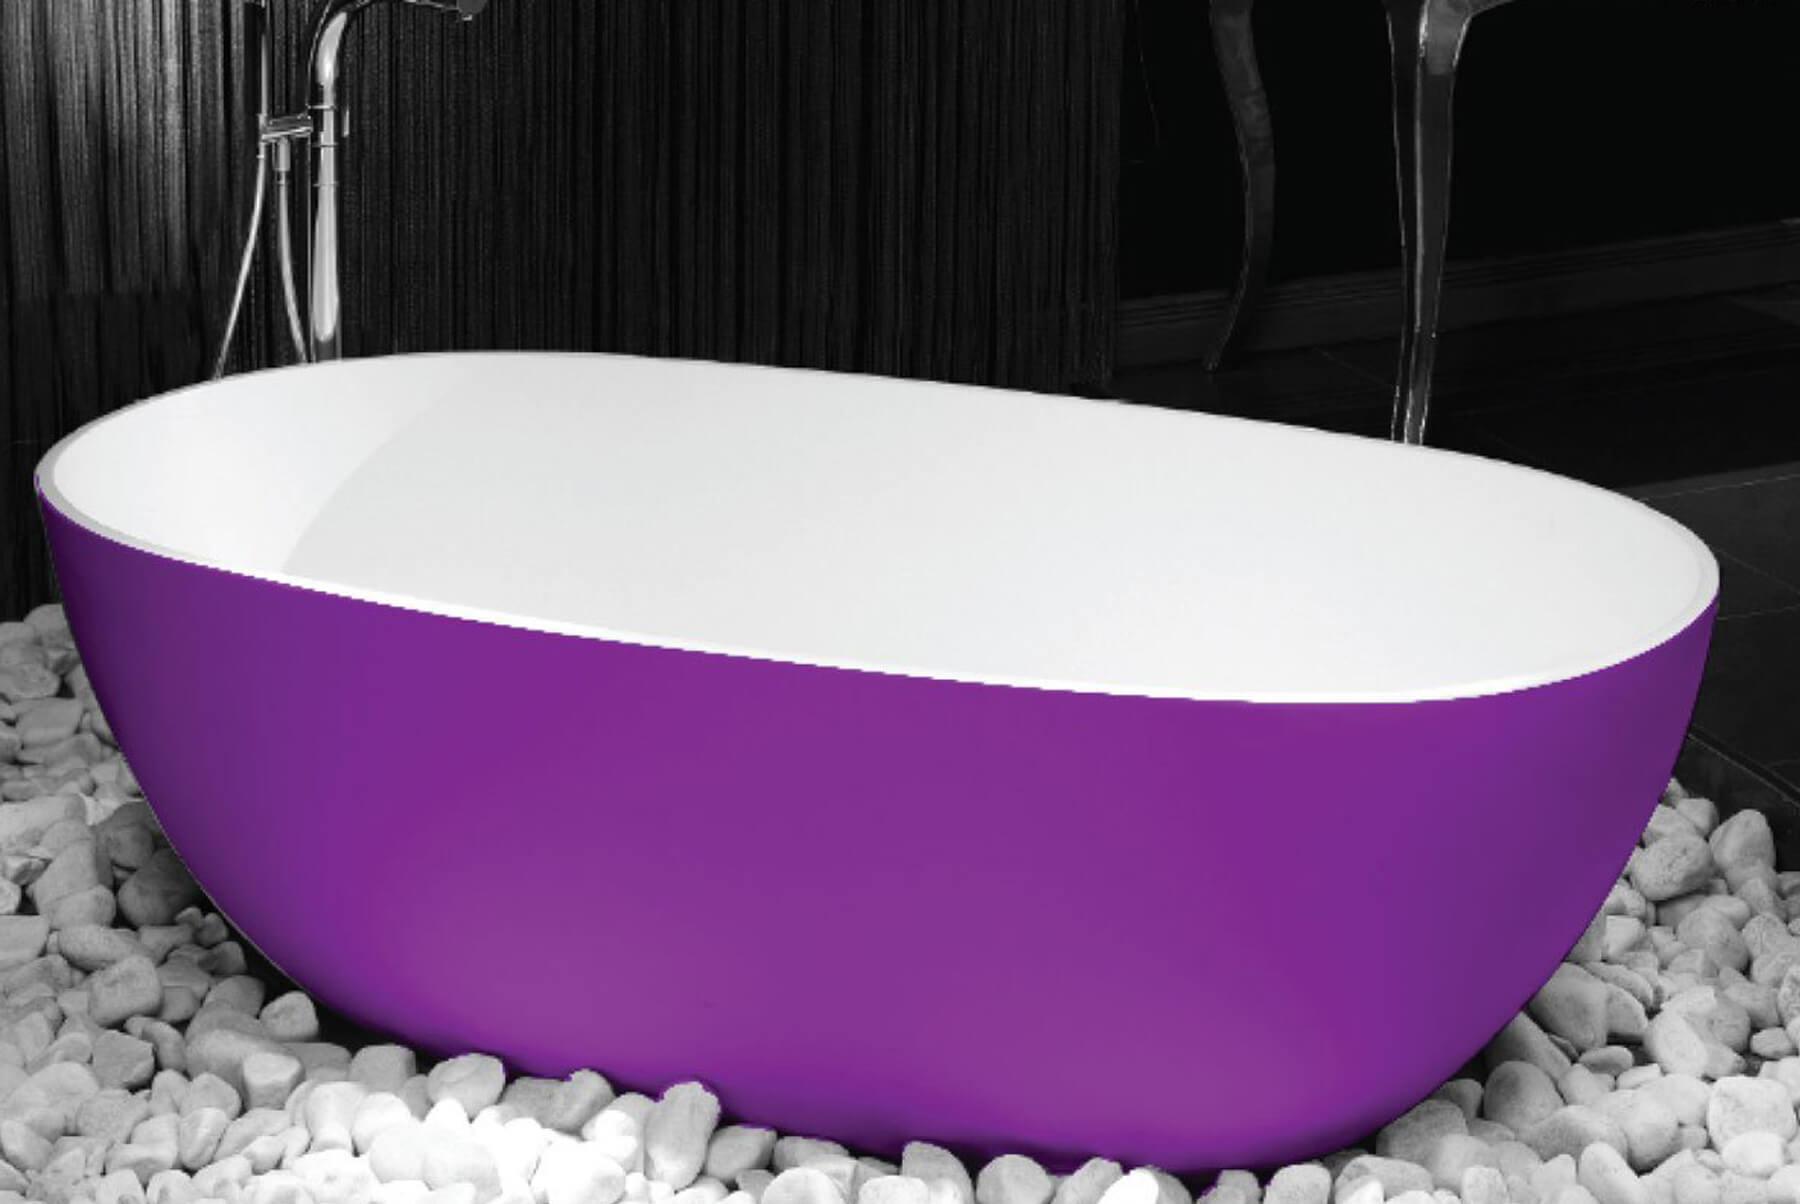 Bath-Tubs-WATERS-CLOUD-BATH-TUB-PURPLE-1800x1204